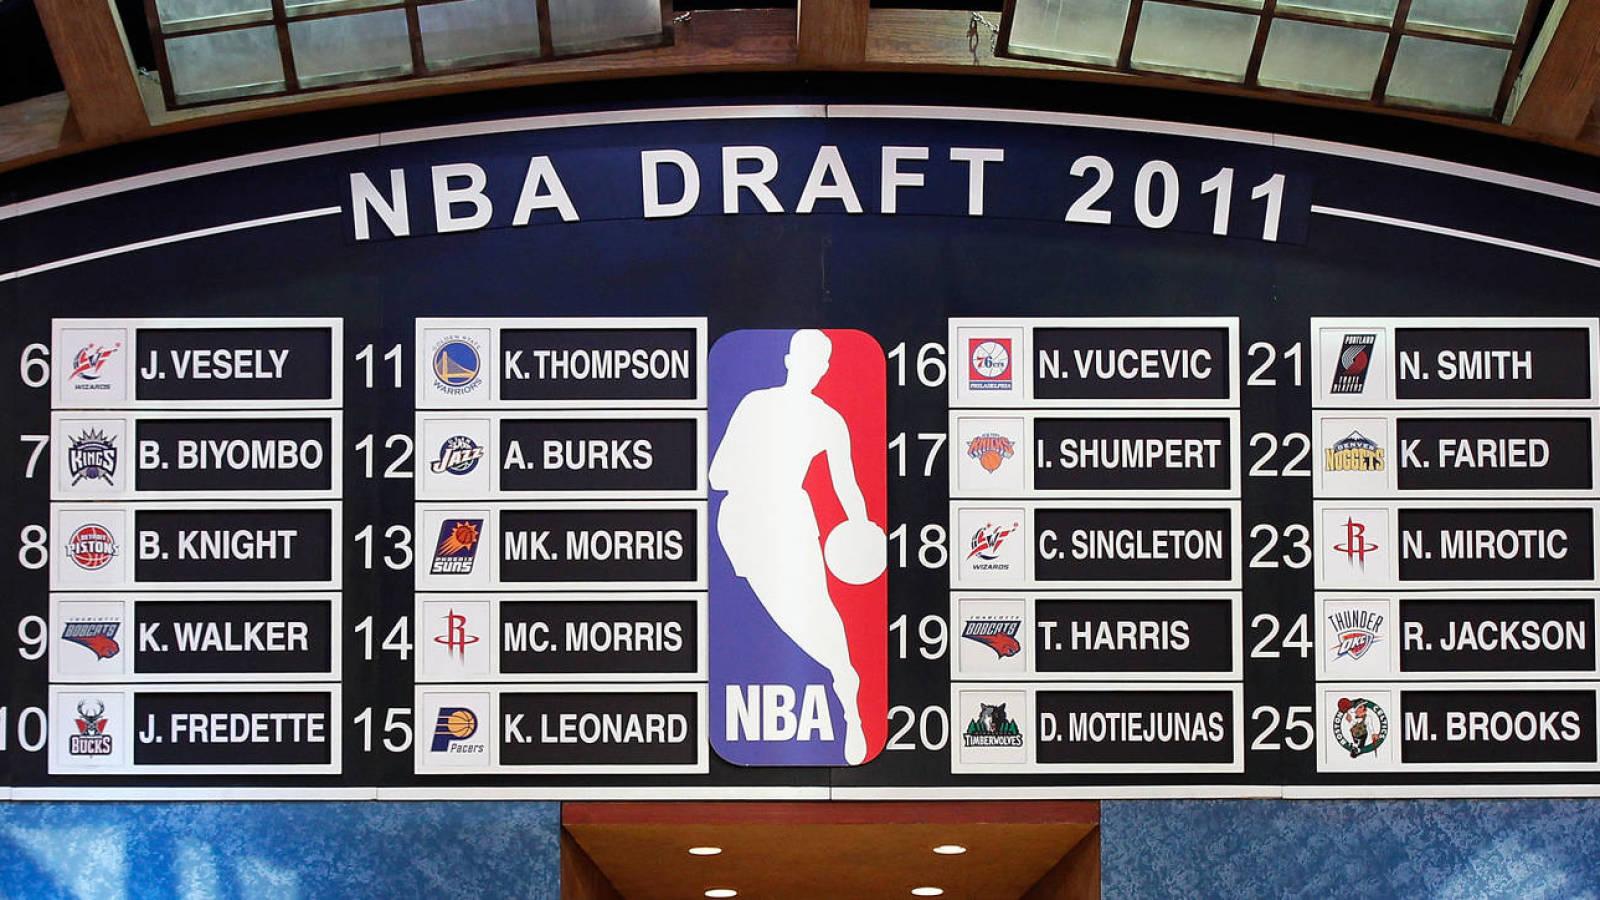 Redrafting the 2011 NBA Draft